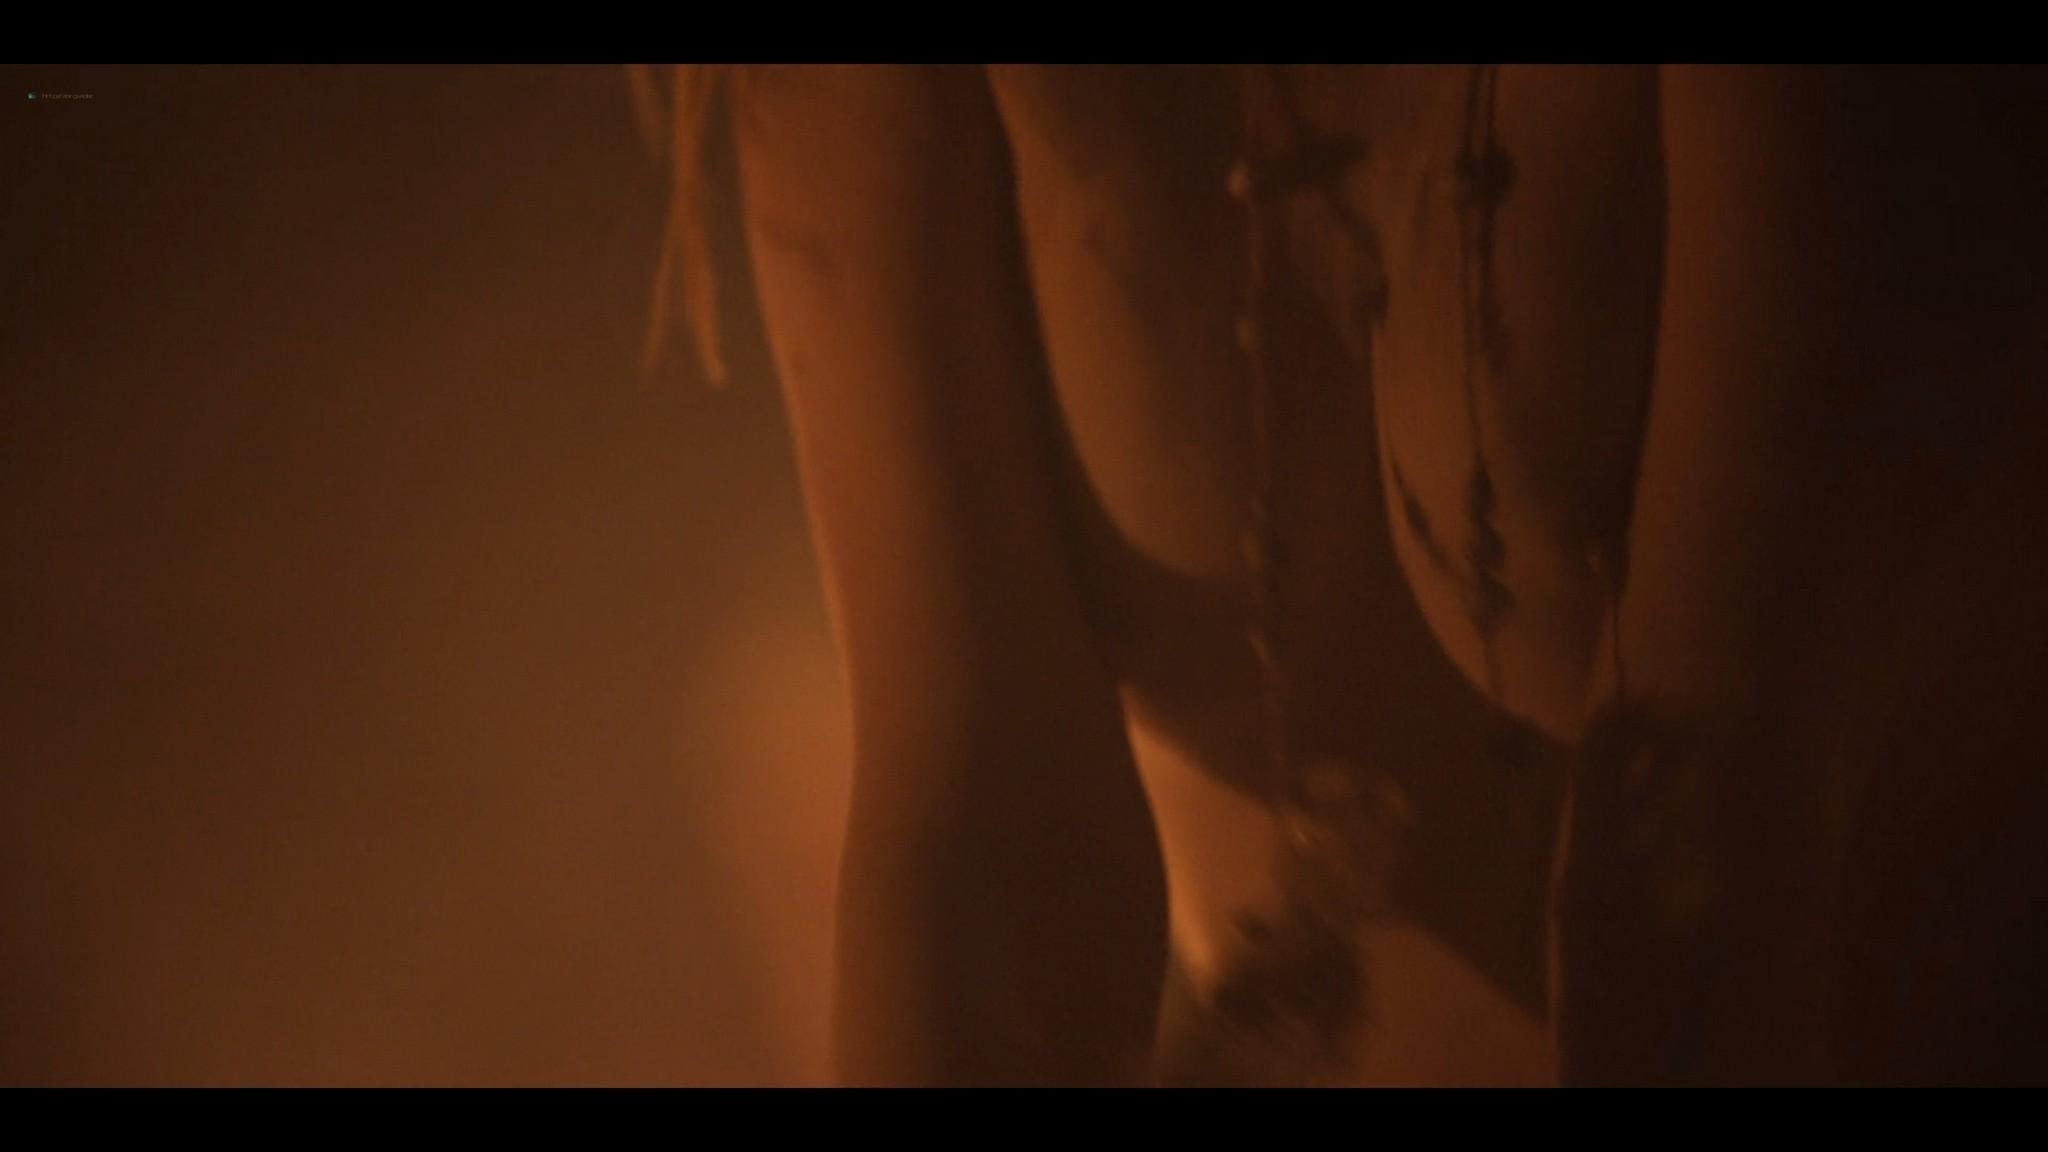 Karoline Hamm nude butt and sex Danica Curcic sexy Equinox 2020 S1 HD 1080p Web 017